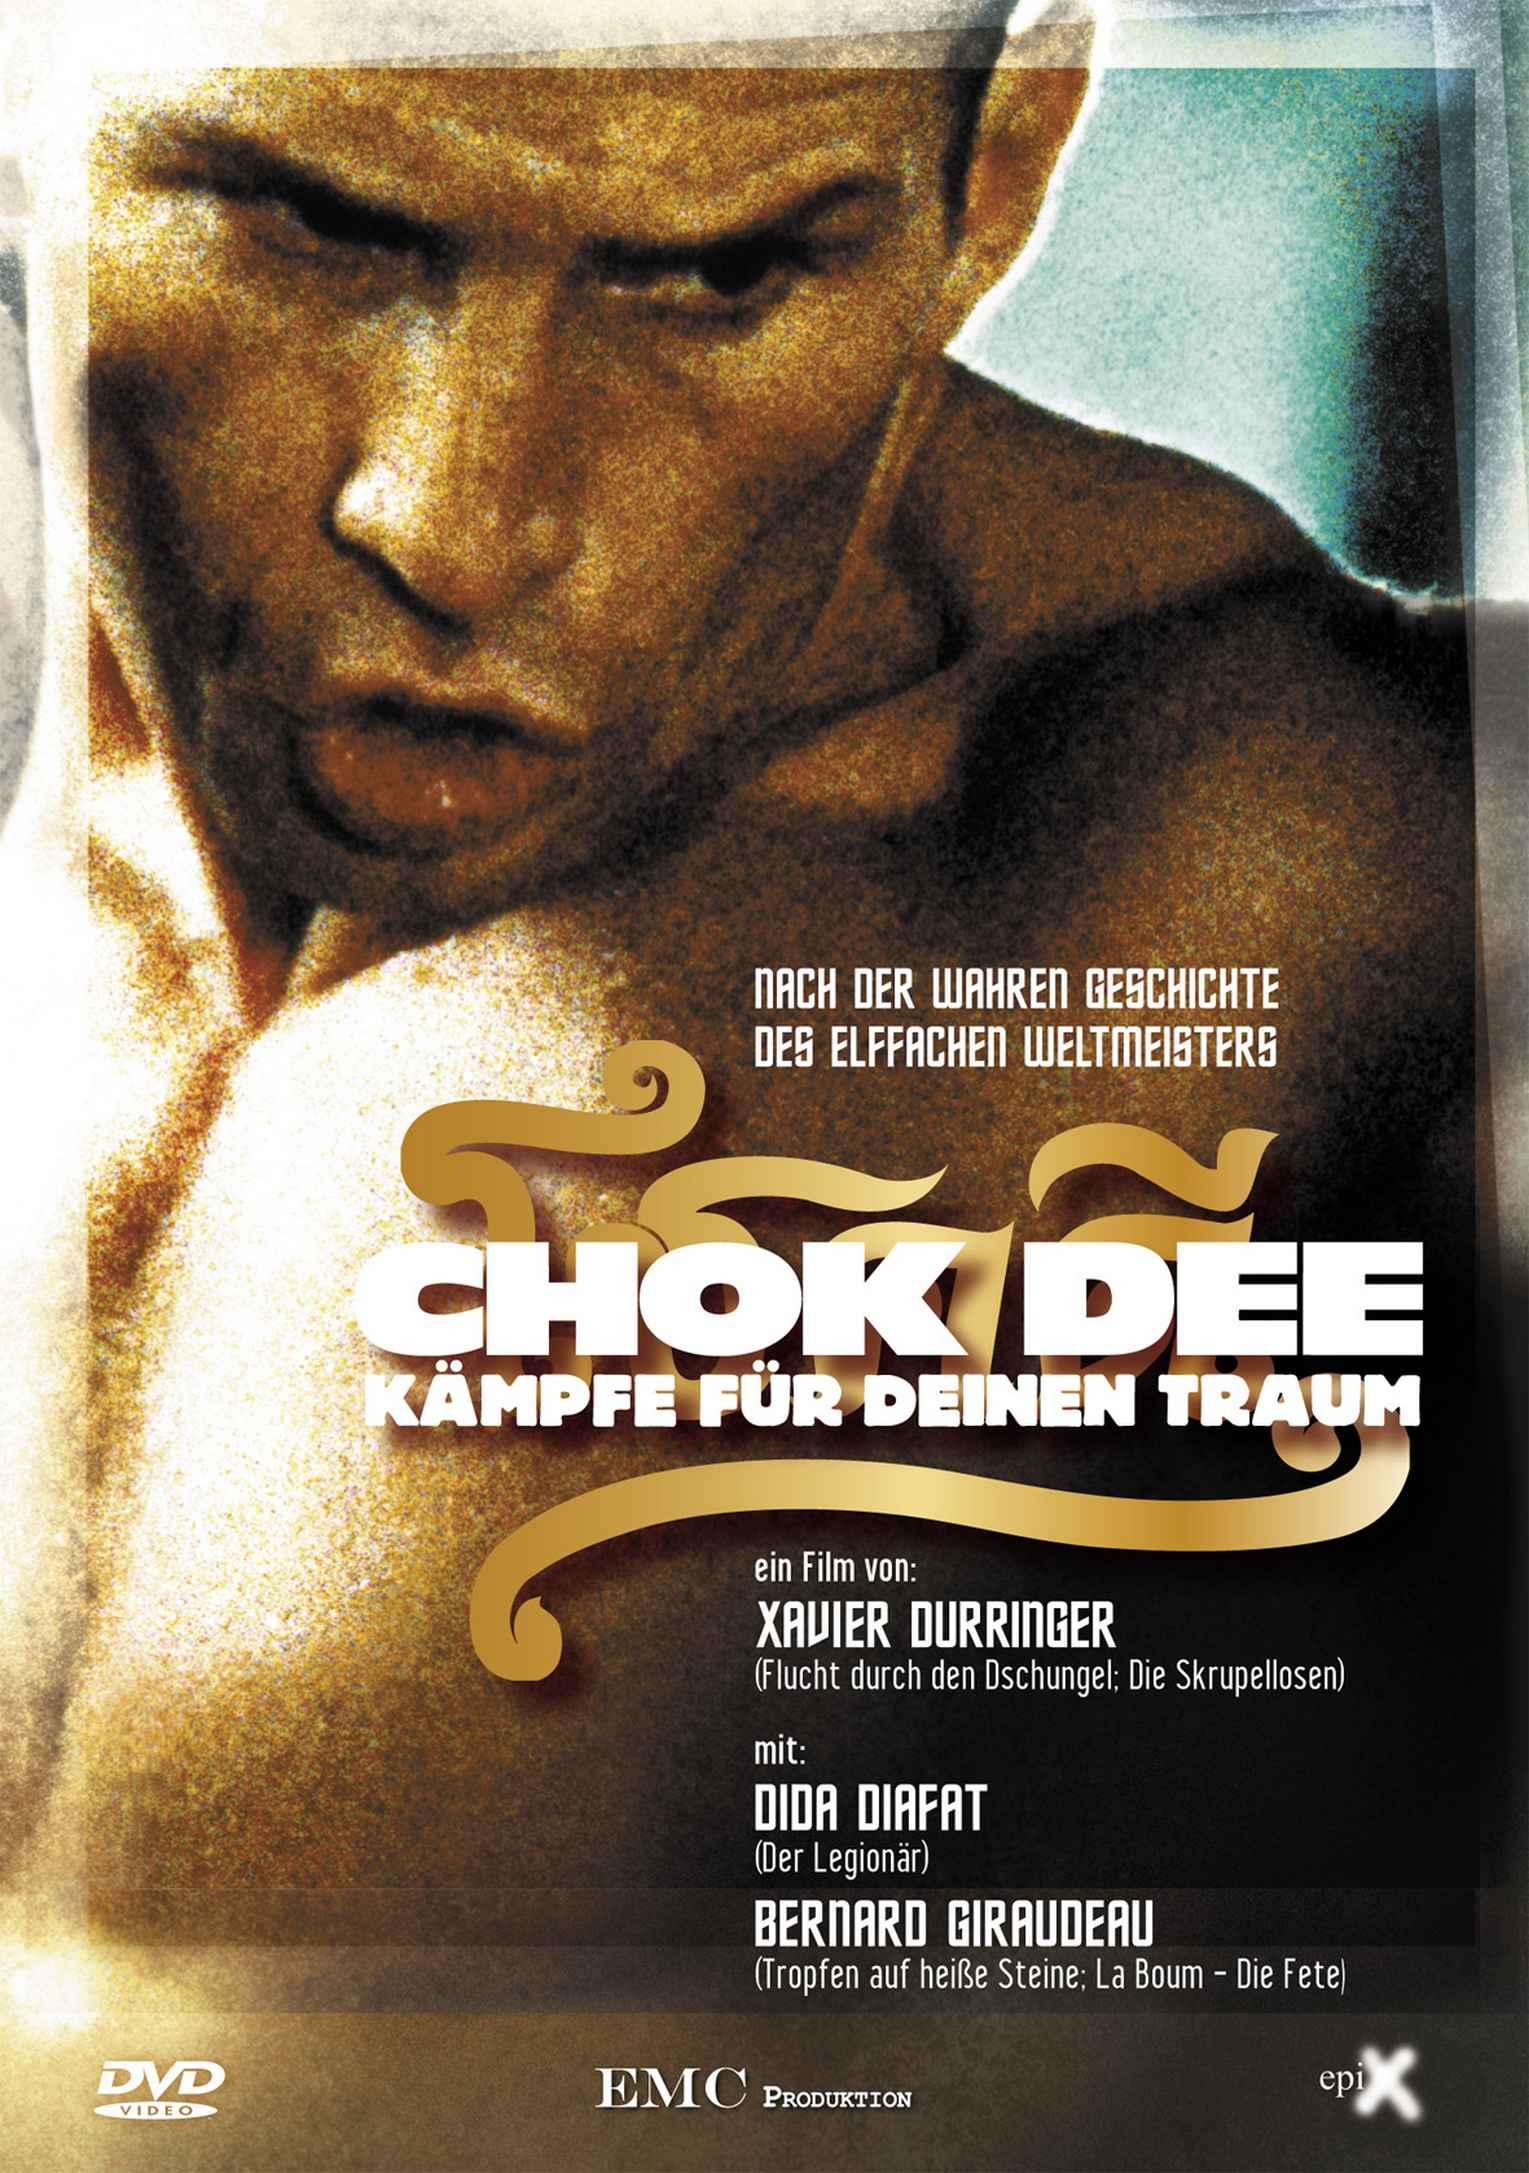 CHOK DEE_Coverfront_FINAL